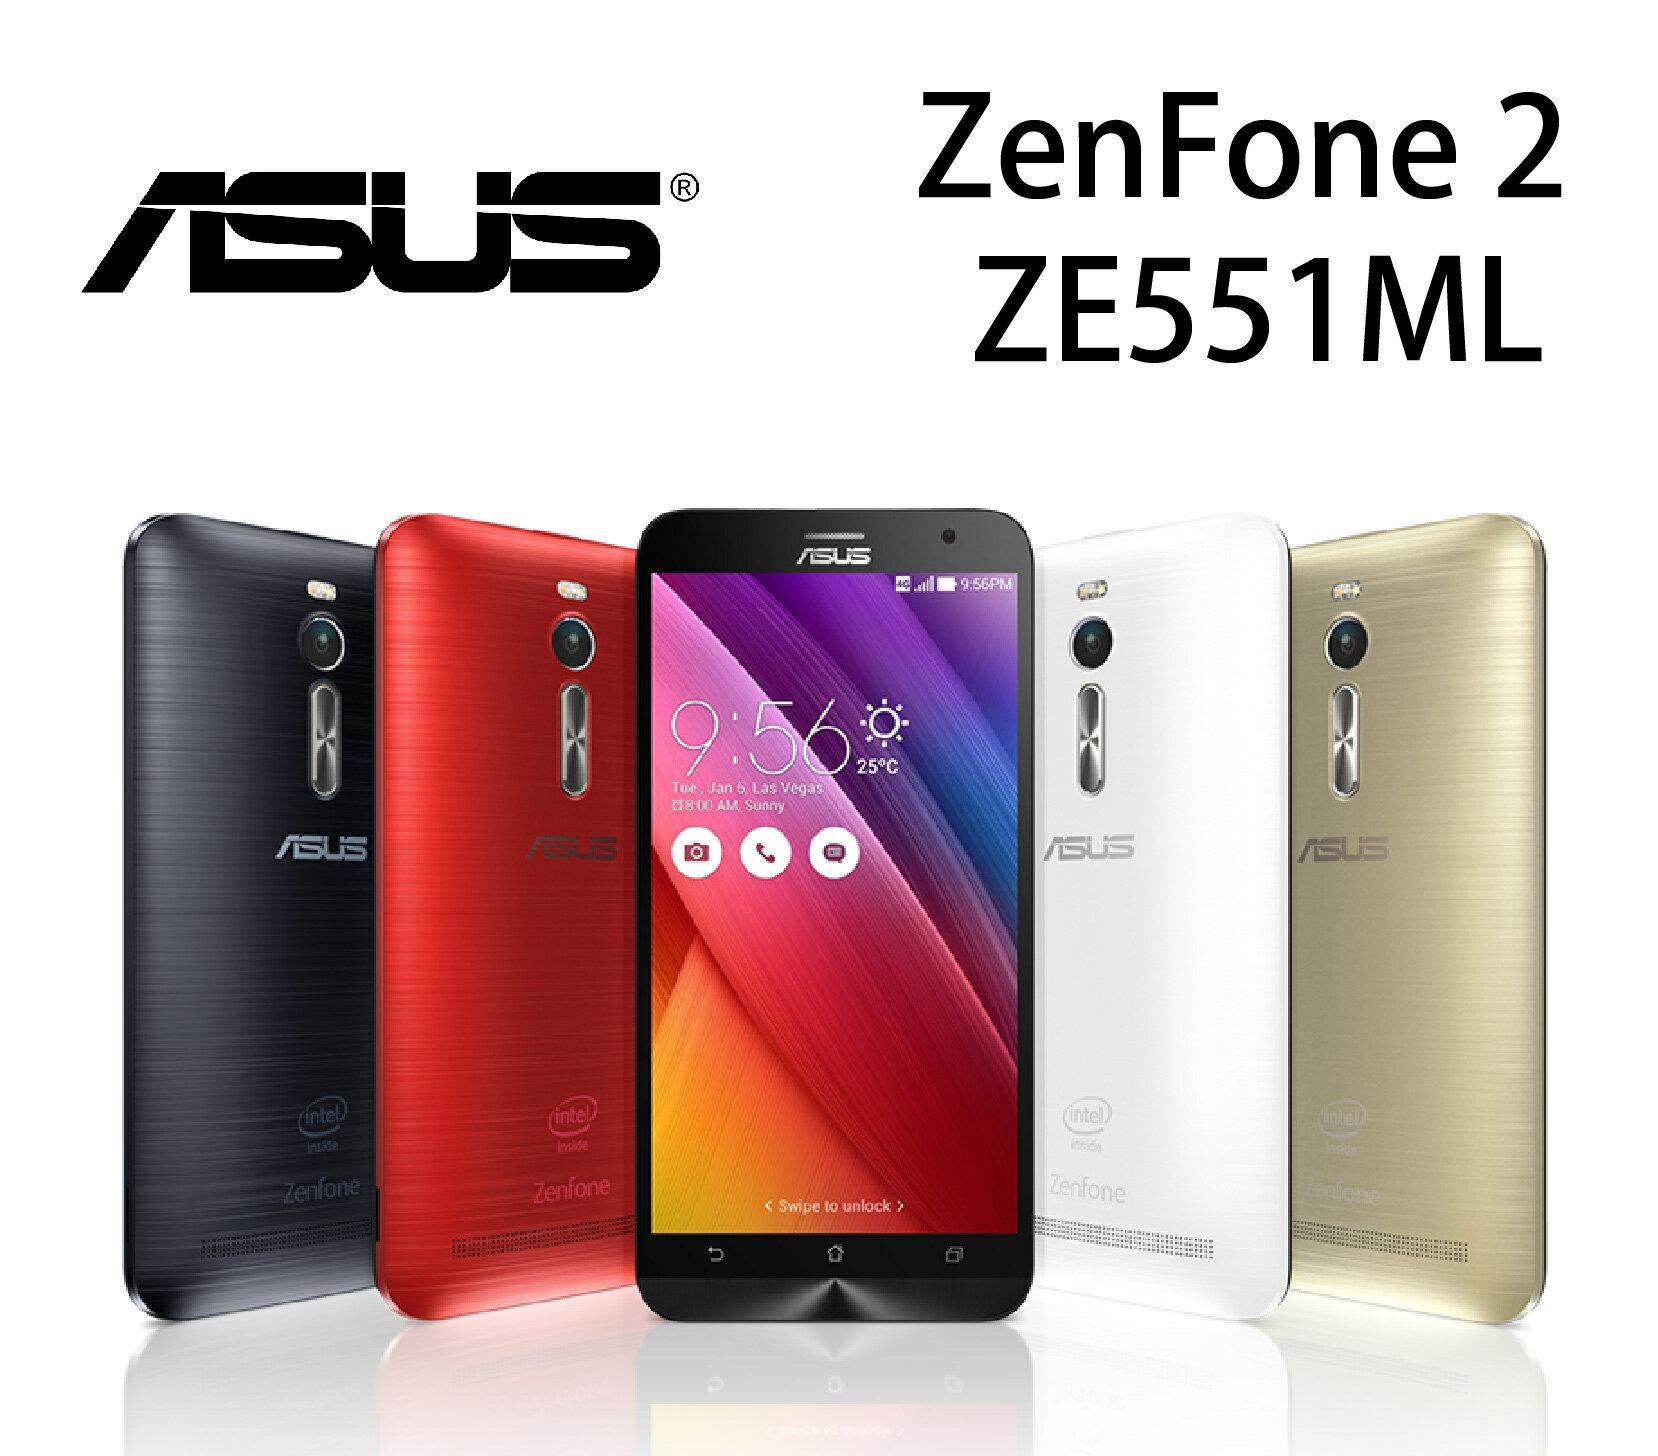 ASUS ZenFone 2 手機 4G版(ZE551ML 4G/64G) 《贈保貼》-銀